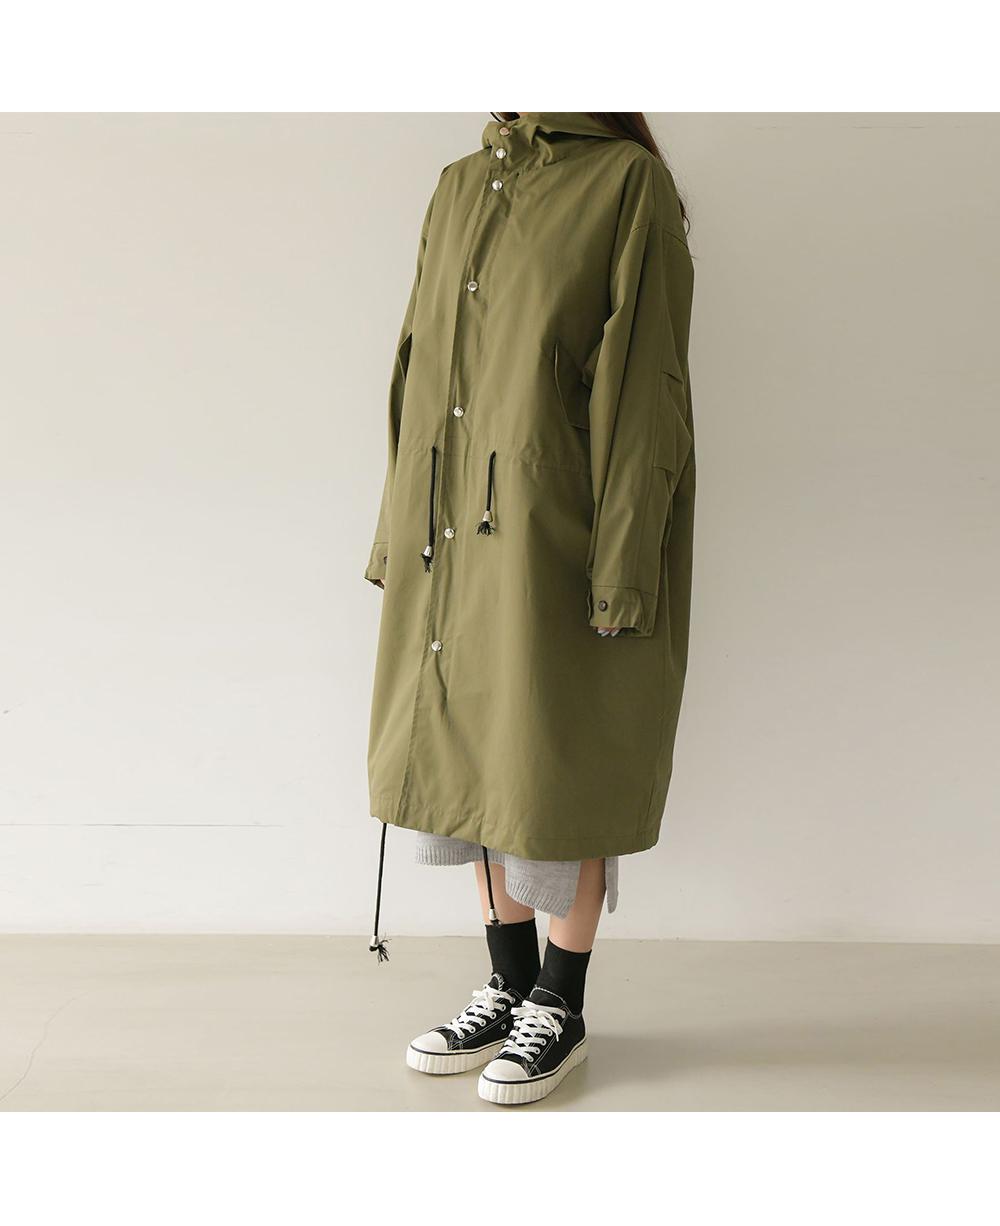 Overfit Hooded String Safari Field Coat Big Size 66-120